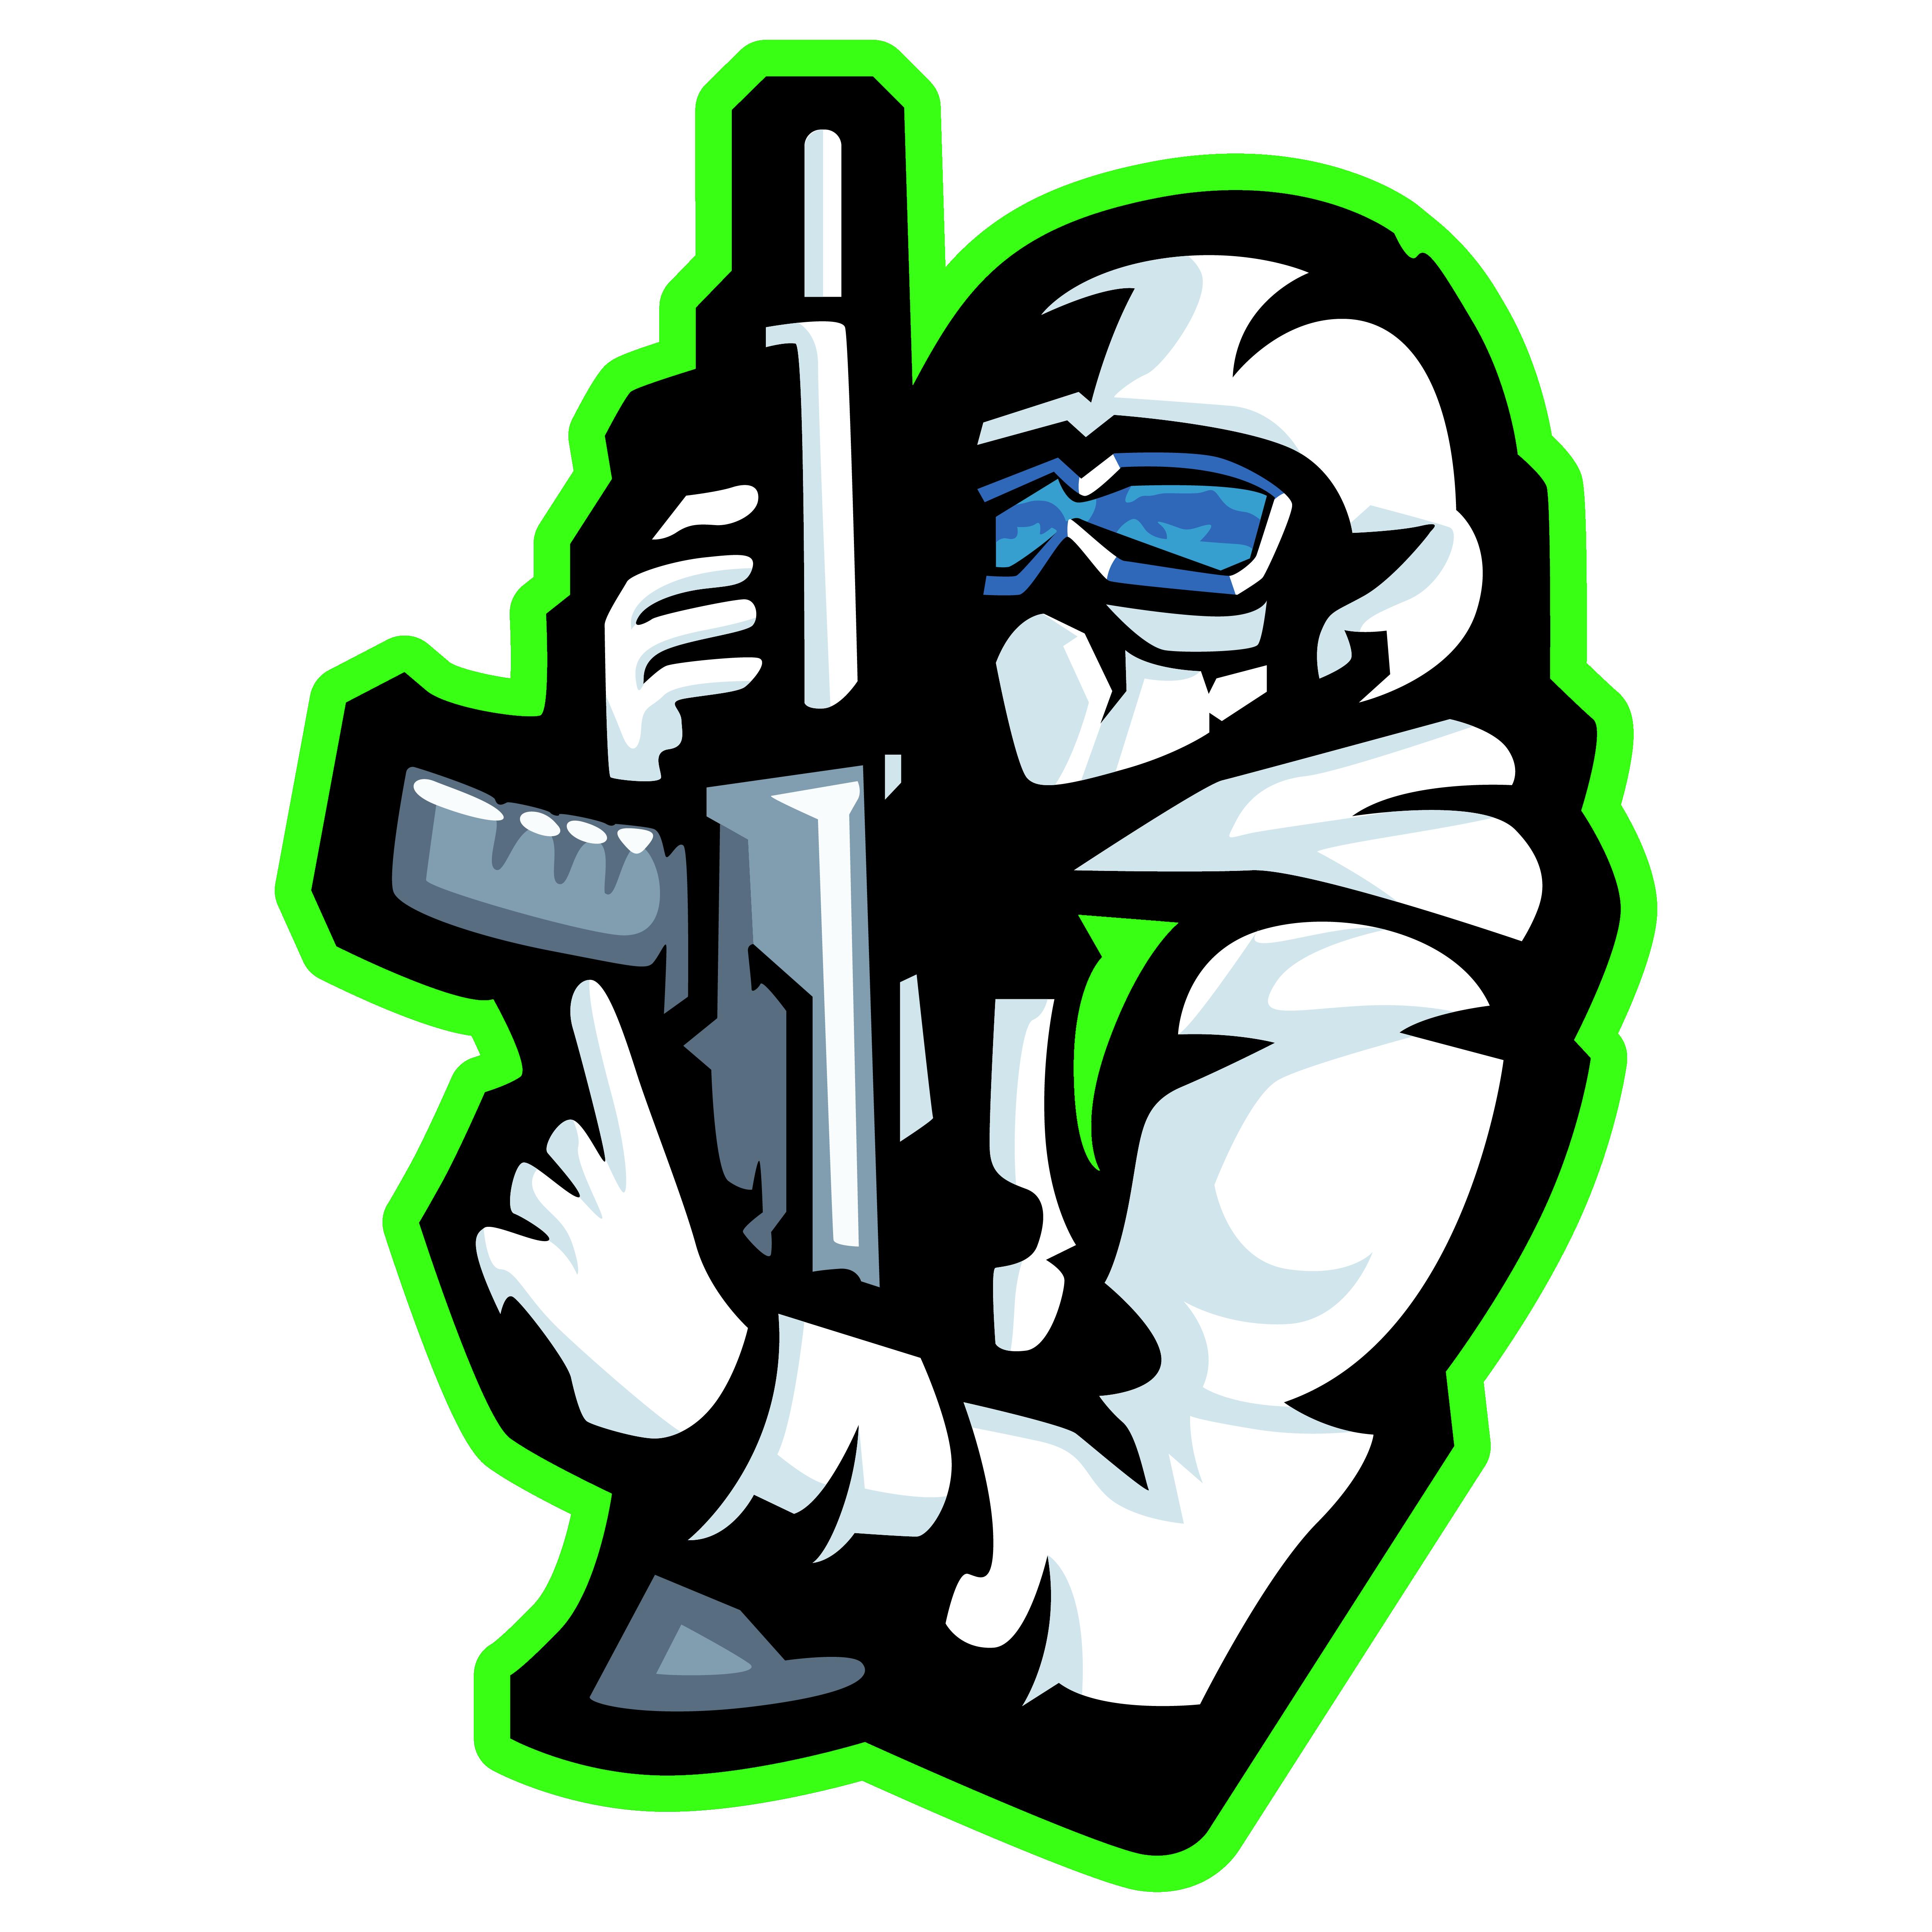 Orphic Gaming's logo